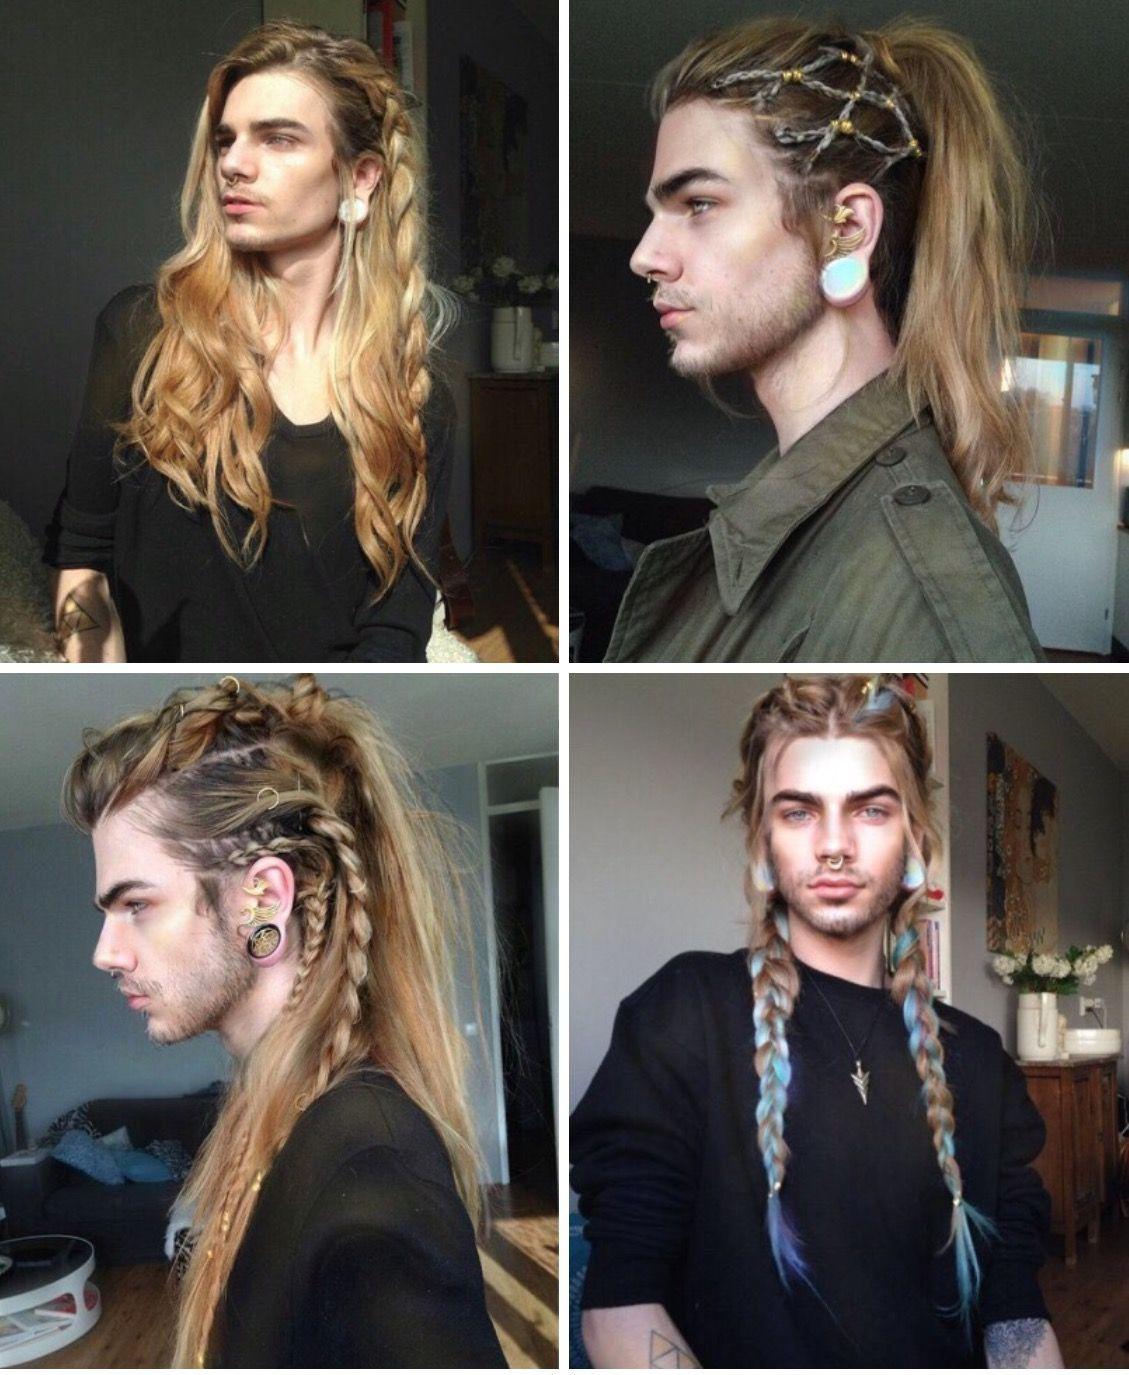 Nils kuiper portrait photography in pinterest hair hair